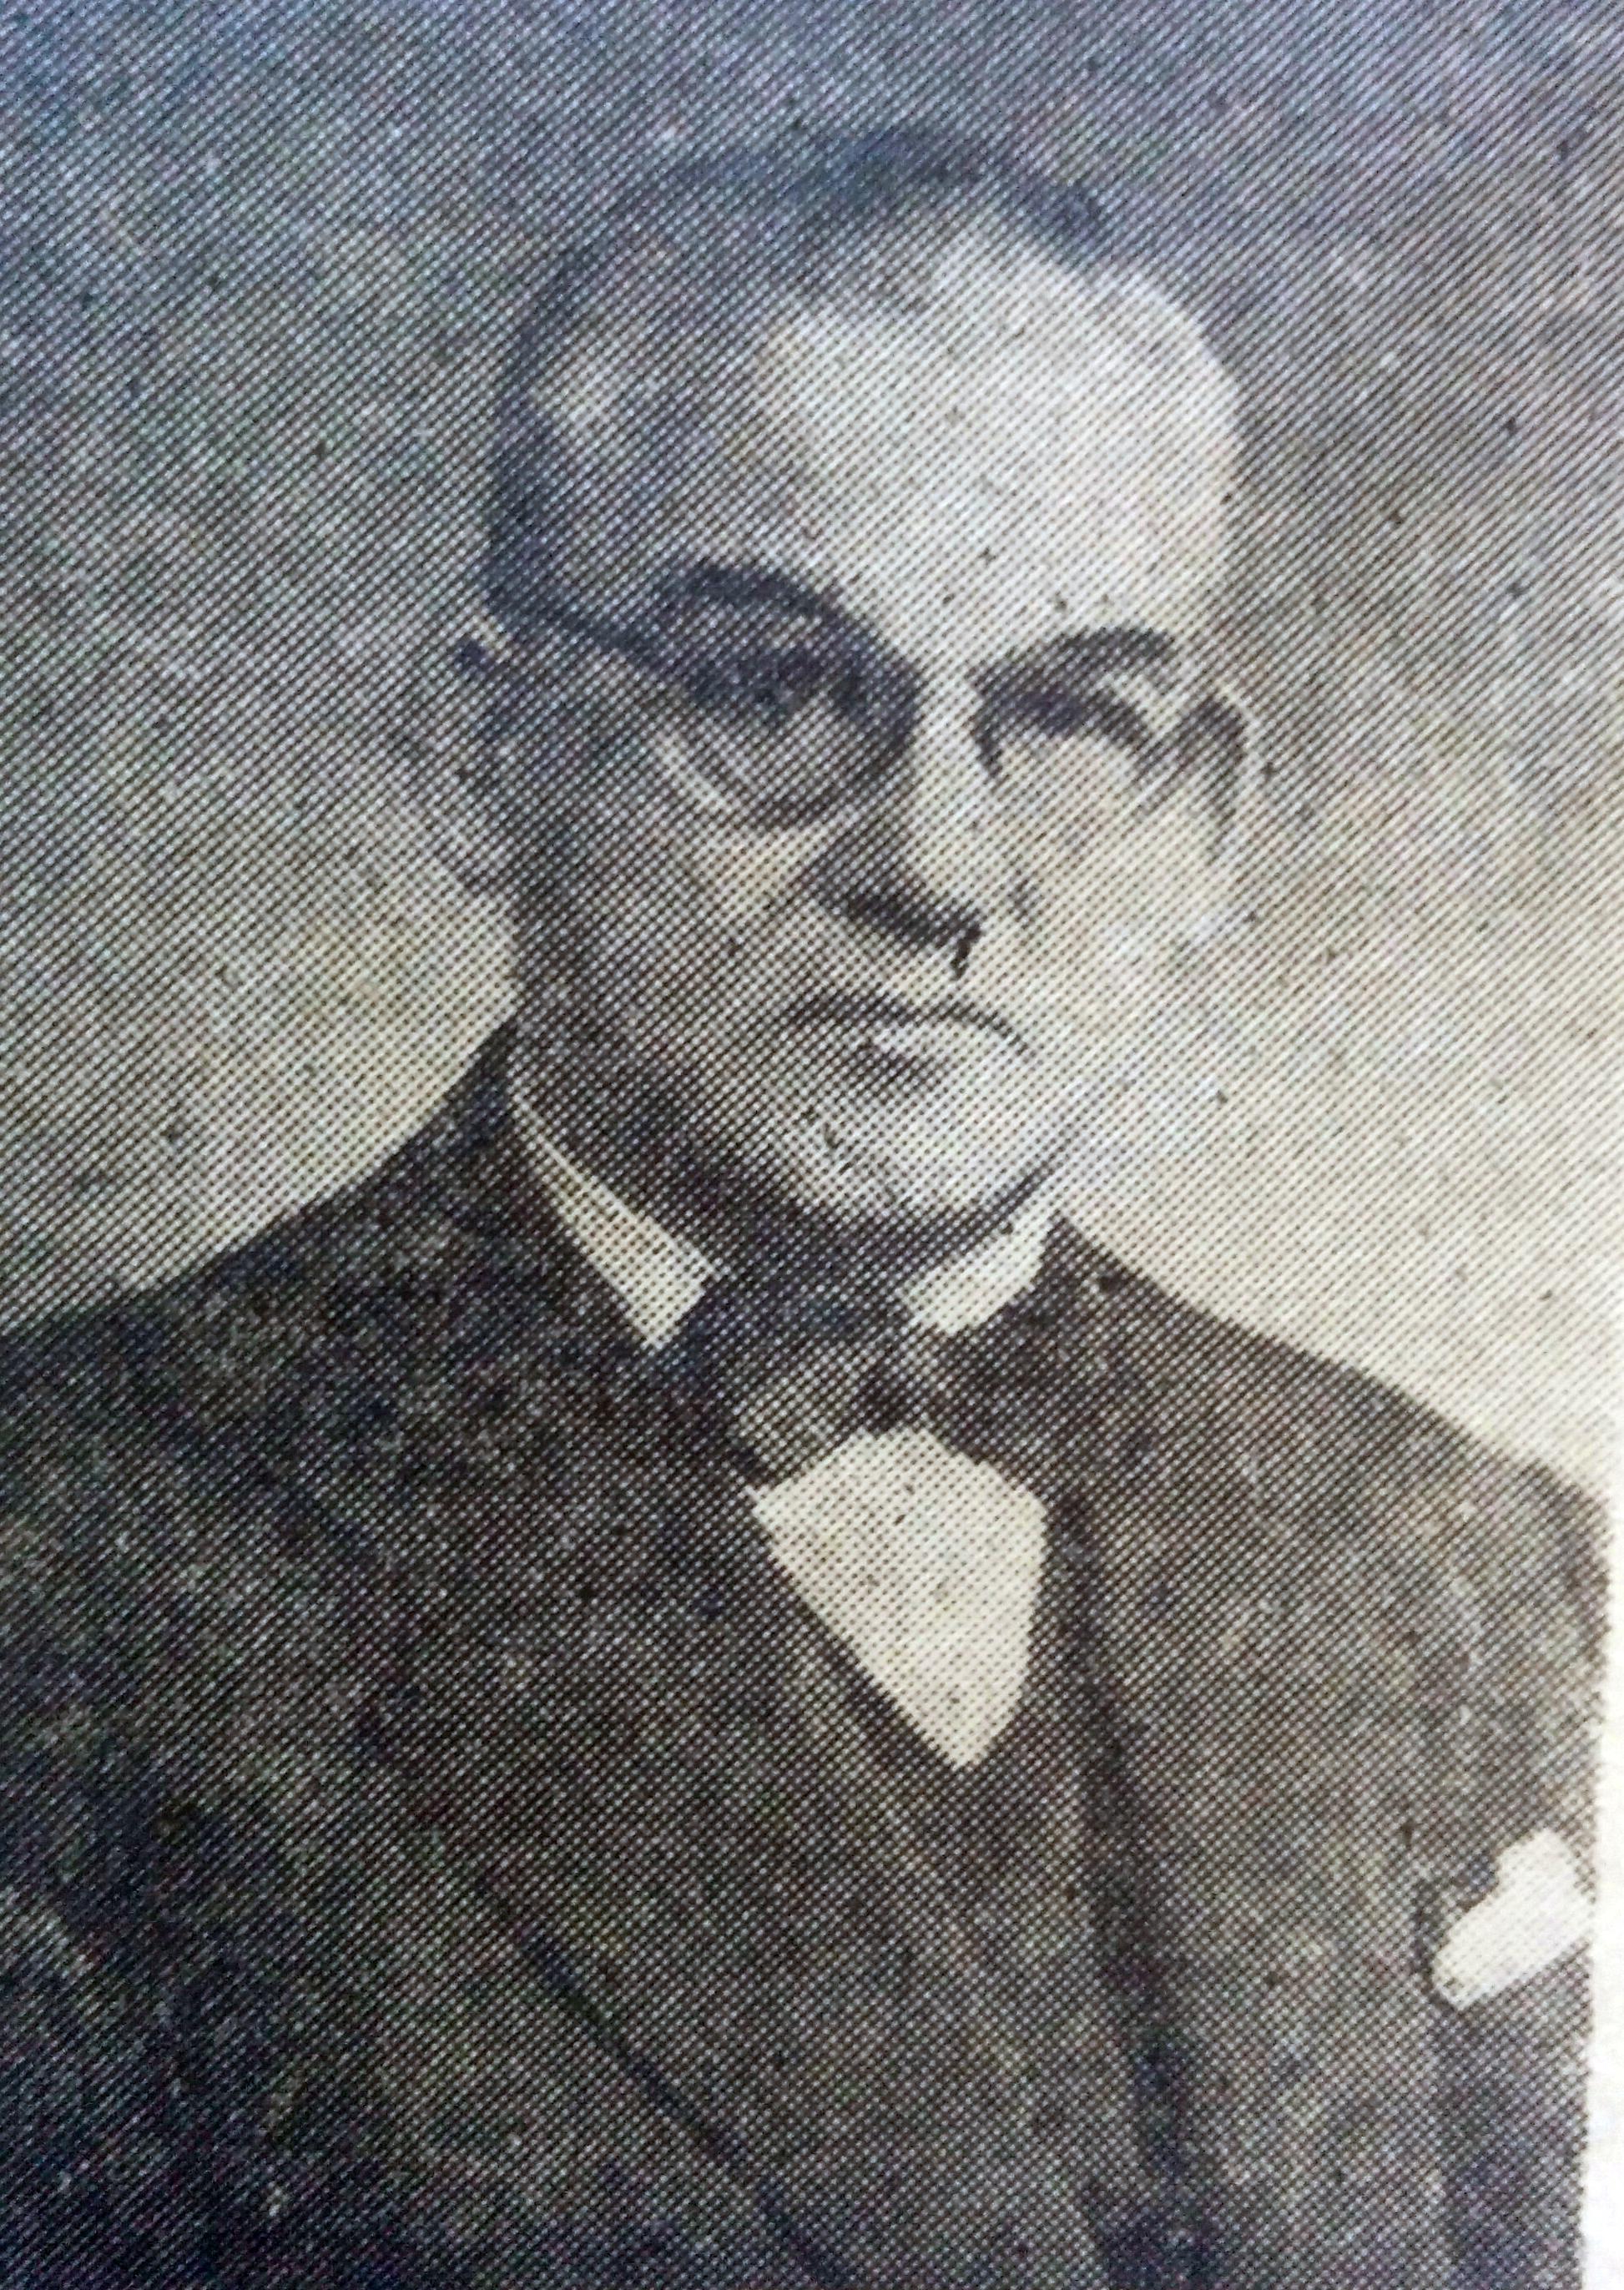 Profesor Juan Manuel Cotta (1887-1964).